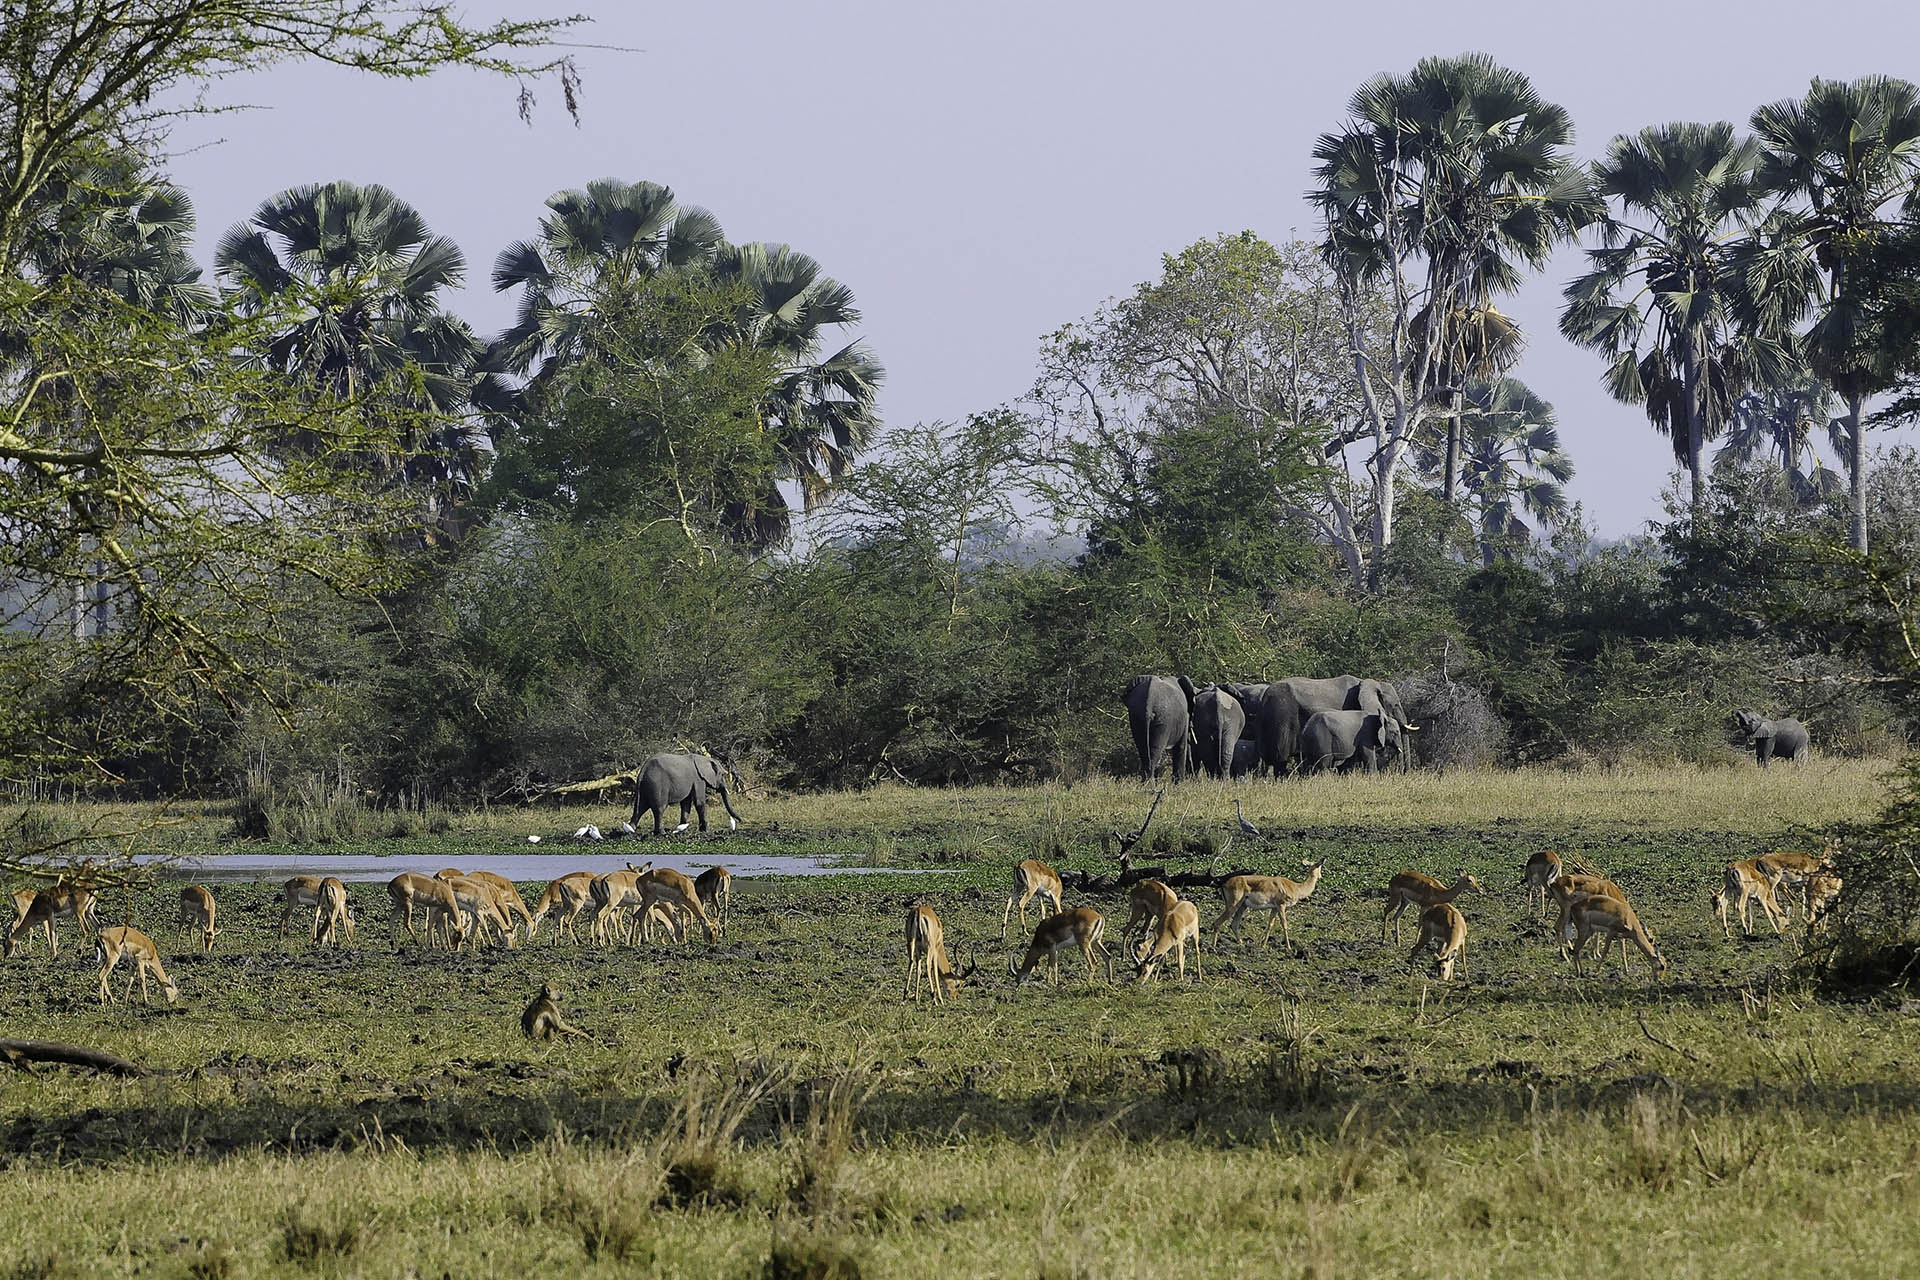 south luangwa national park tours zambia-national-parks-malawian-style-malawi-adventures-experiences-specialist-tour-operator-wildlife-mvuu